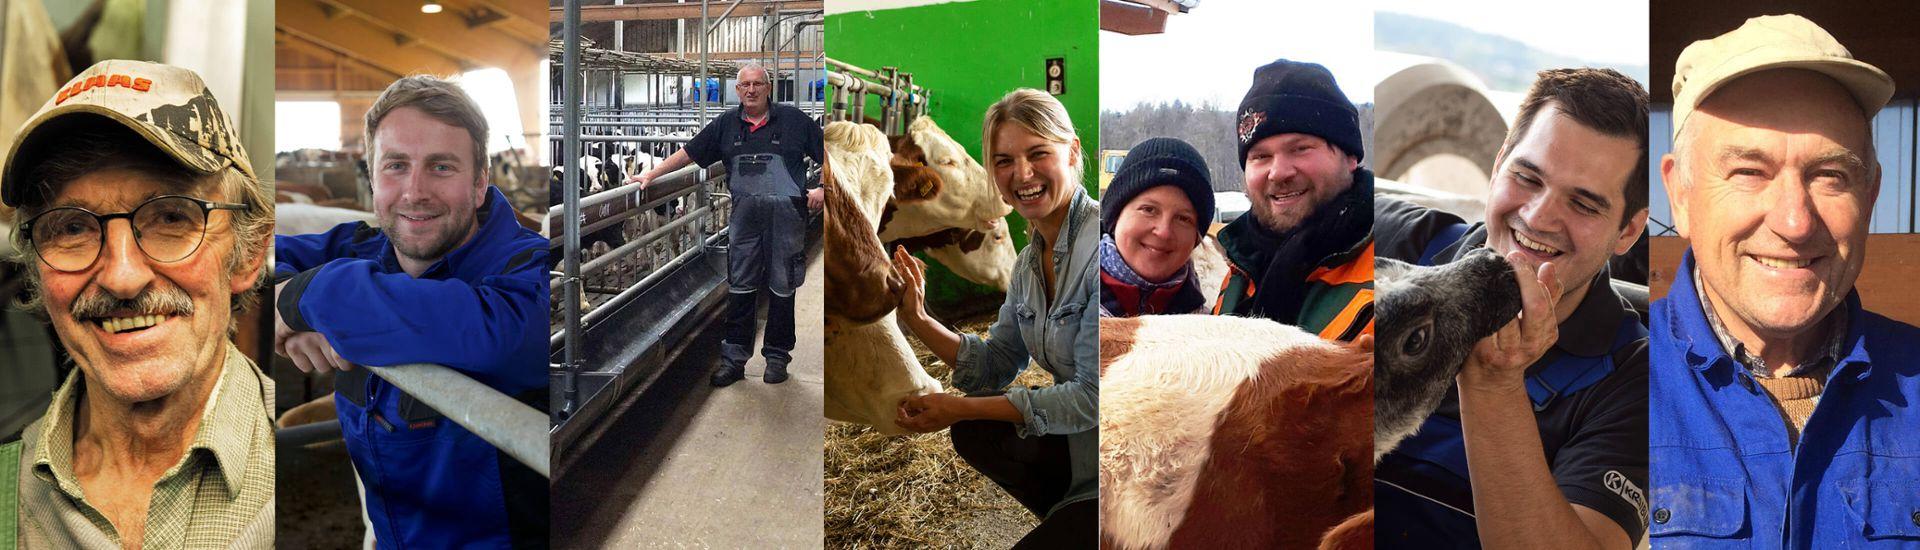 Field reports / testimonials on KRAIBURG rubber floorings for livestock housing